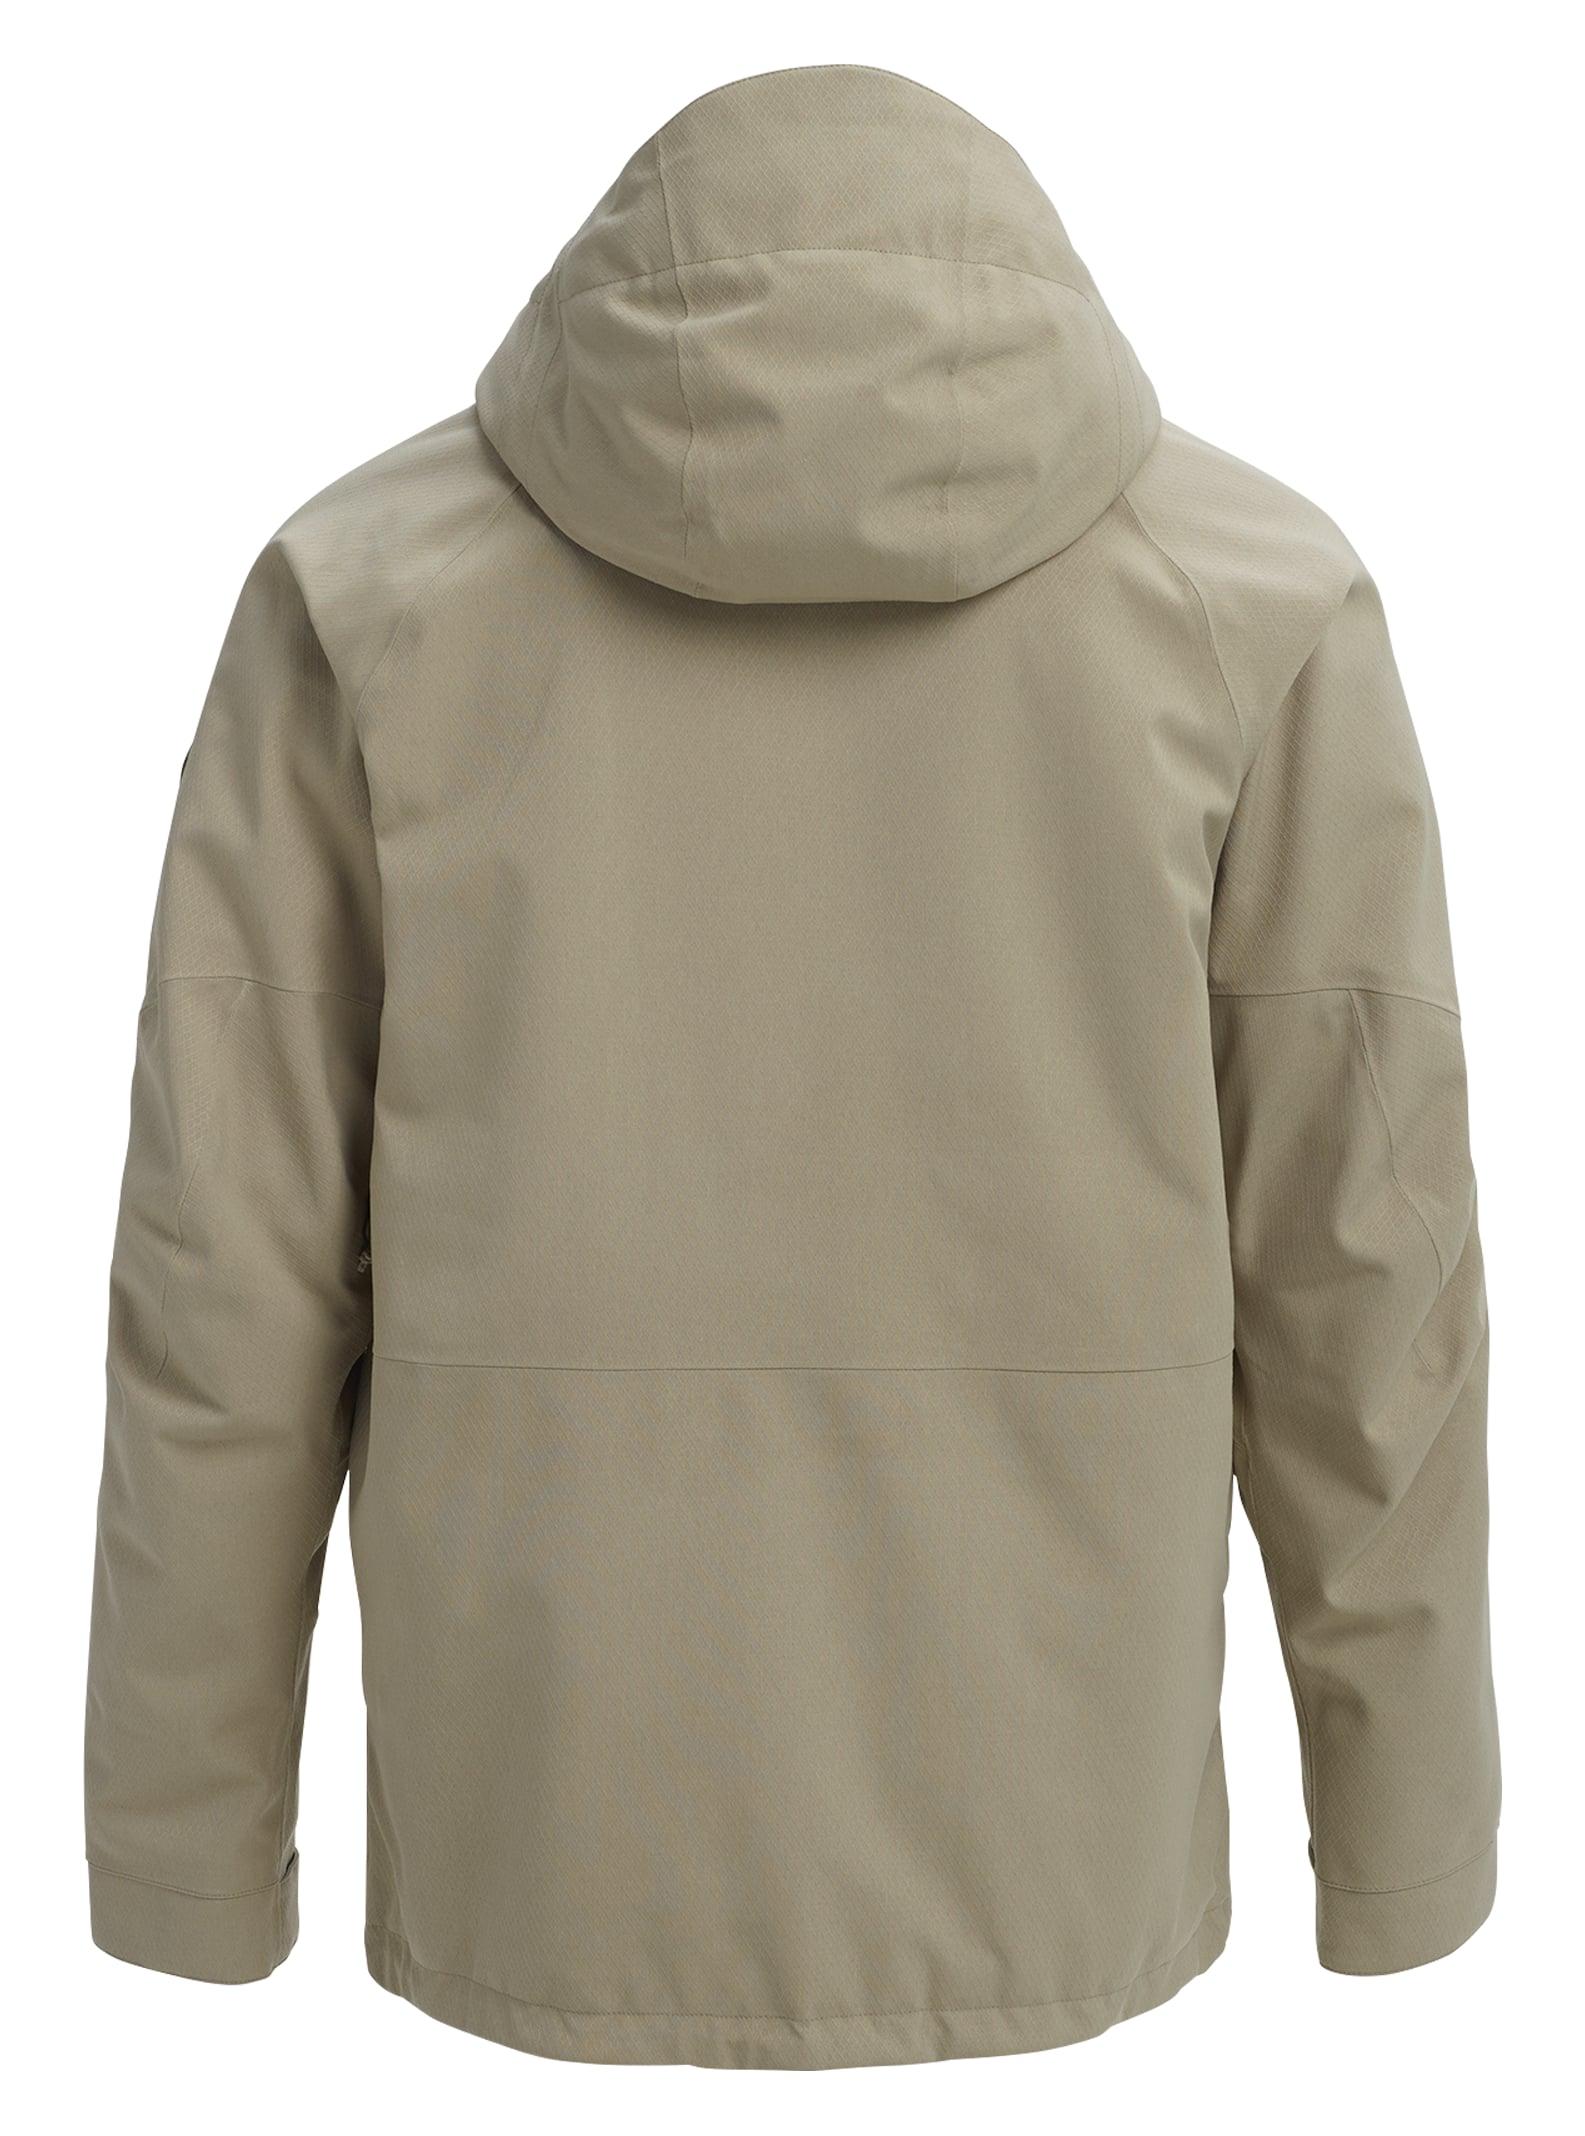 ef332873f6 Men s Snowboard Jackets